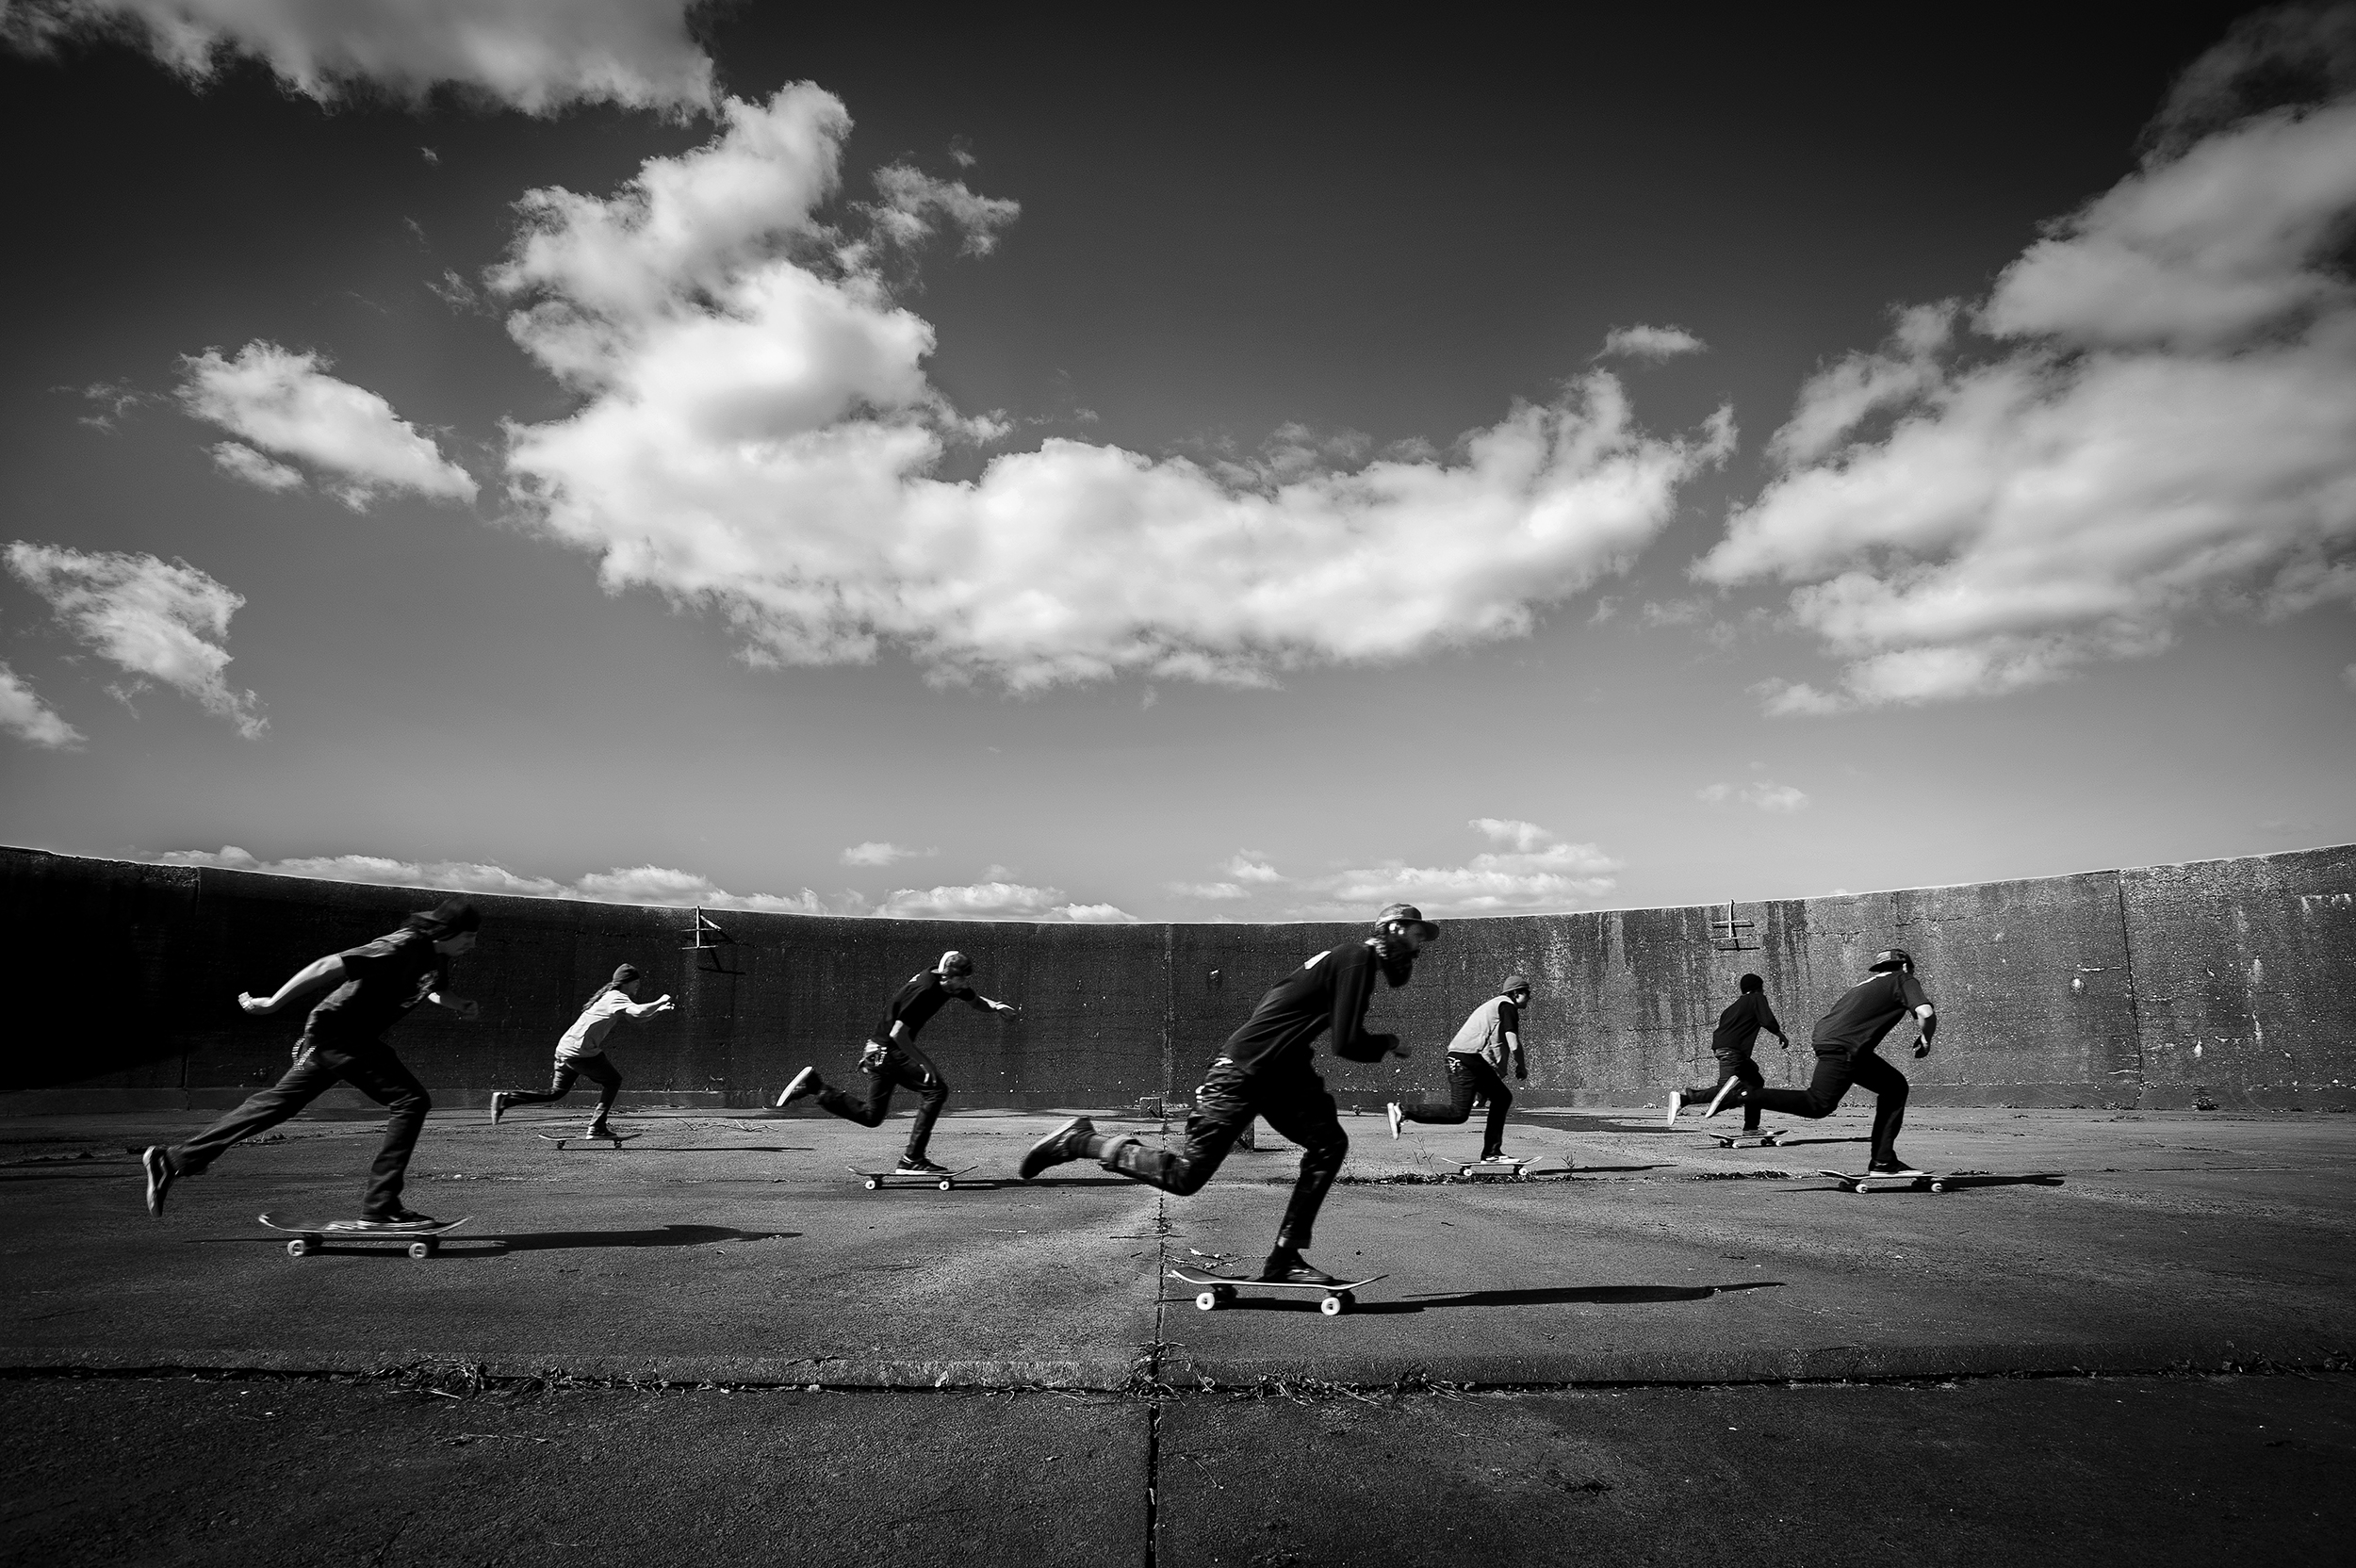 Destroy_The_Furture_Skate-1.jpg